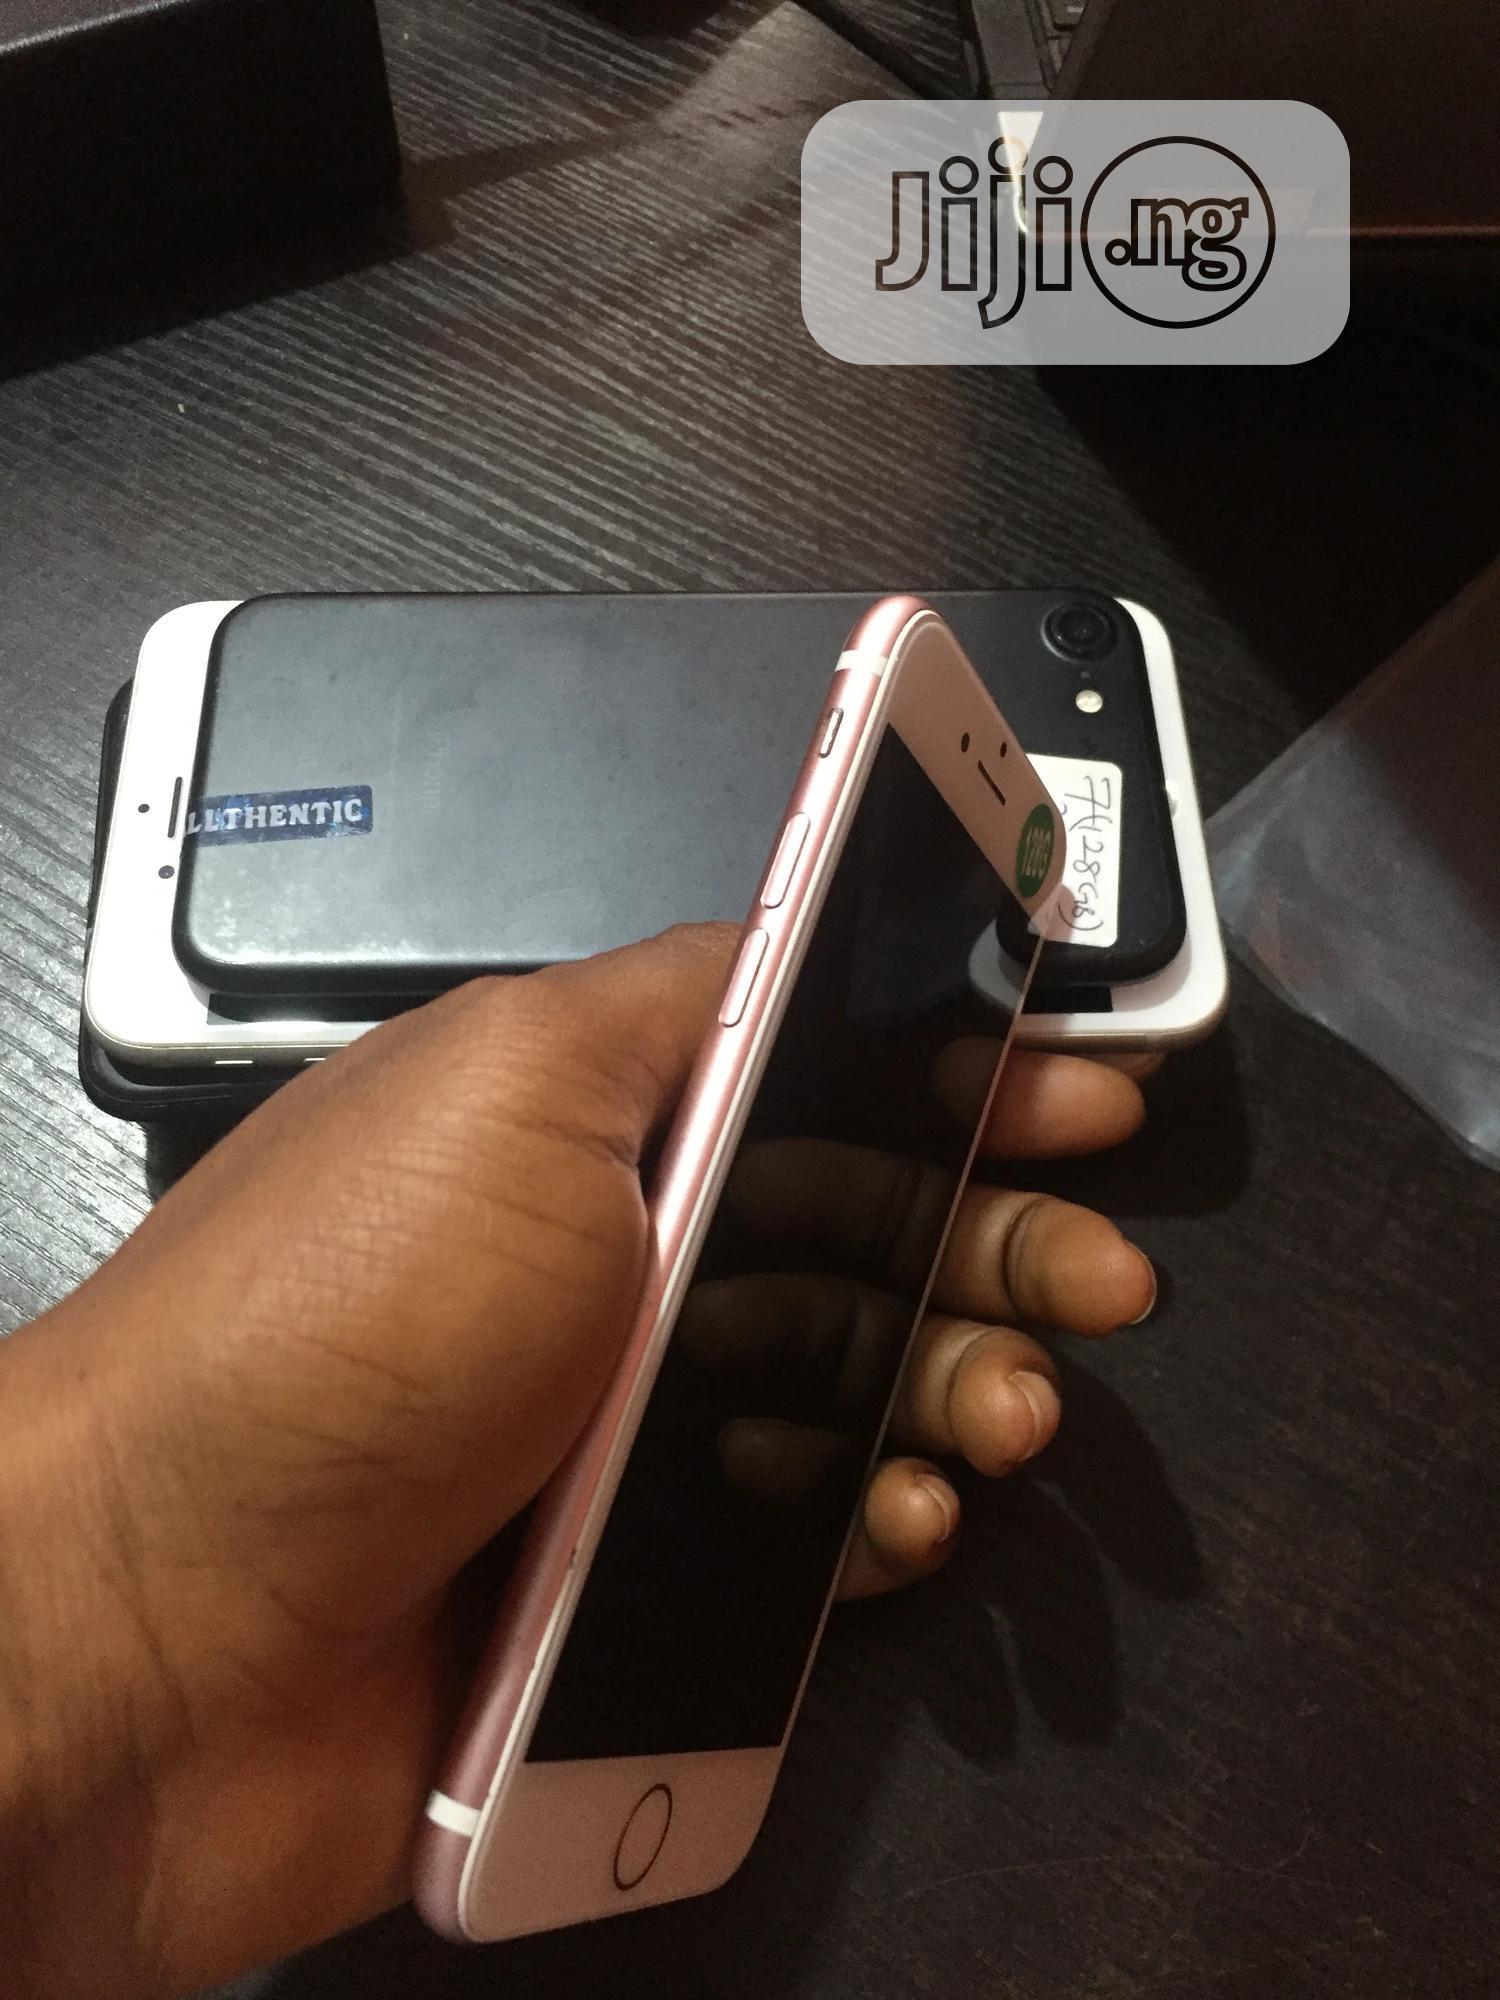 Apple iPhone 7 128 GB Gold | Mobile Phones for sale in Benin City, Edo State, Nigeria